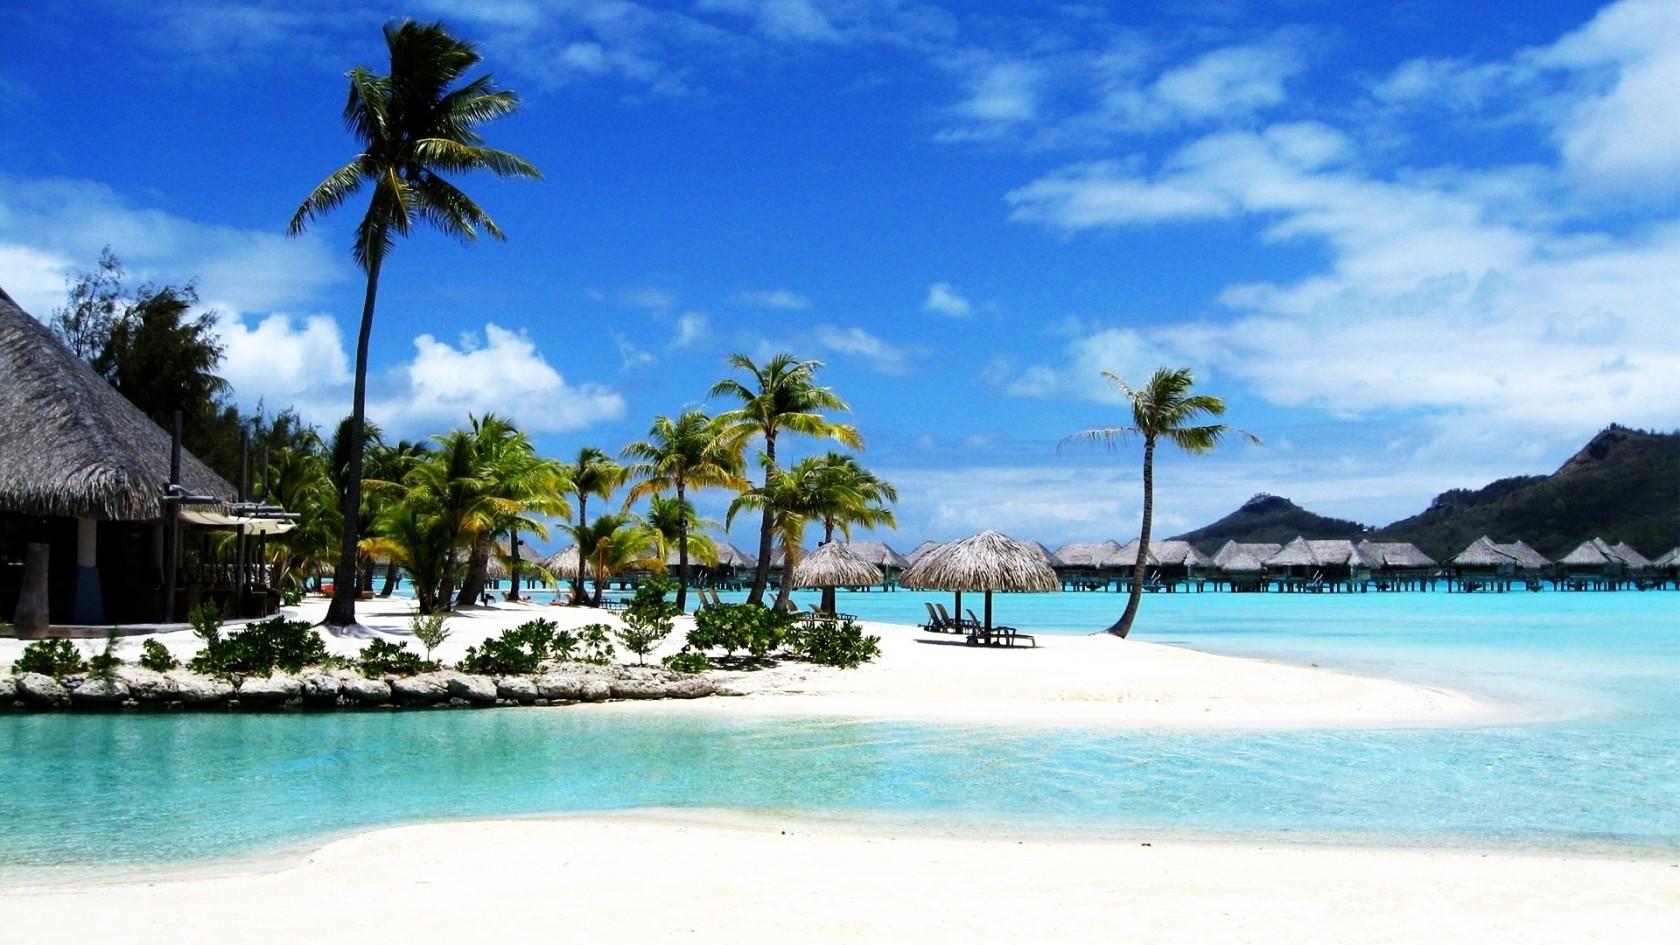 Tropical Beach Resort HD Wallpaper Tropical Beach Resort 1680x945